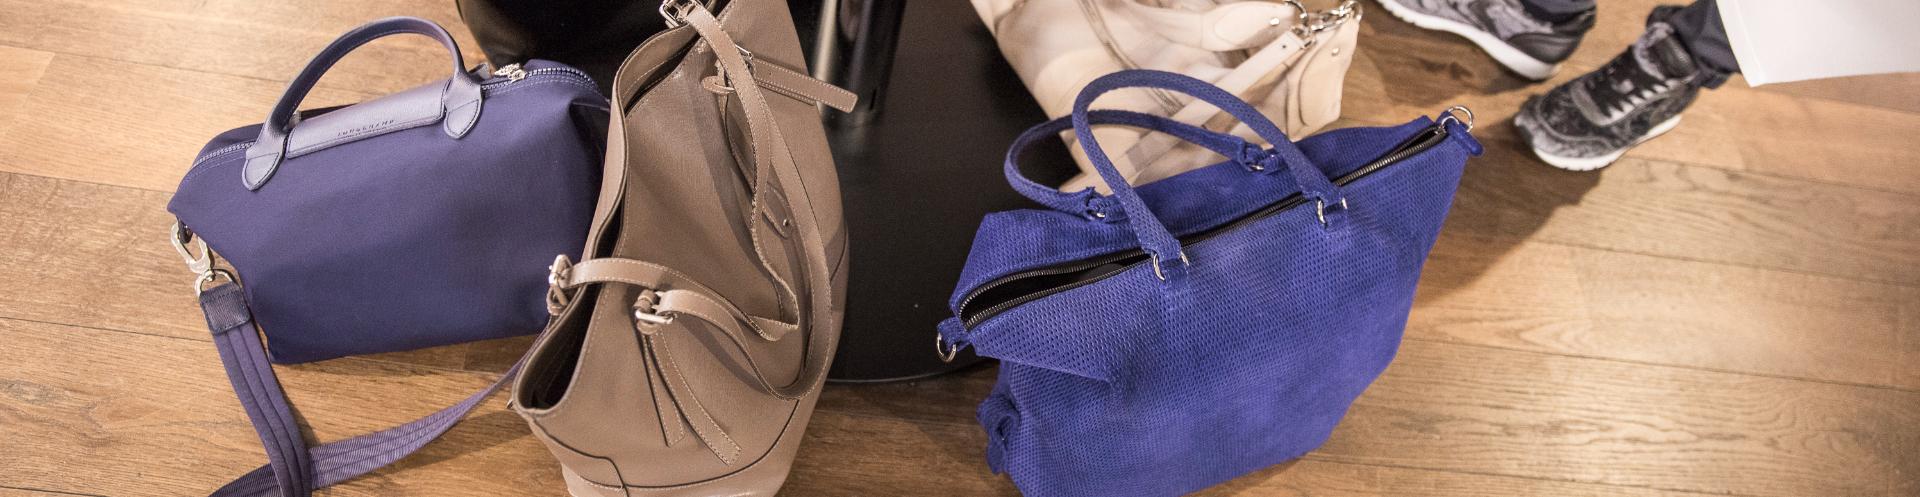 lo-handtaschen